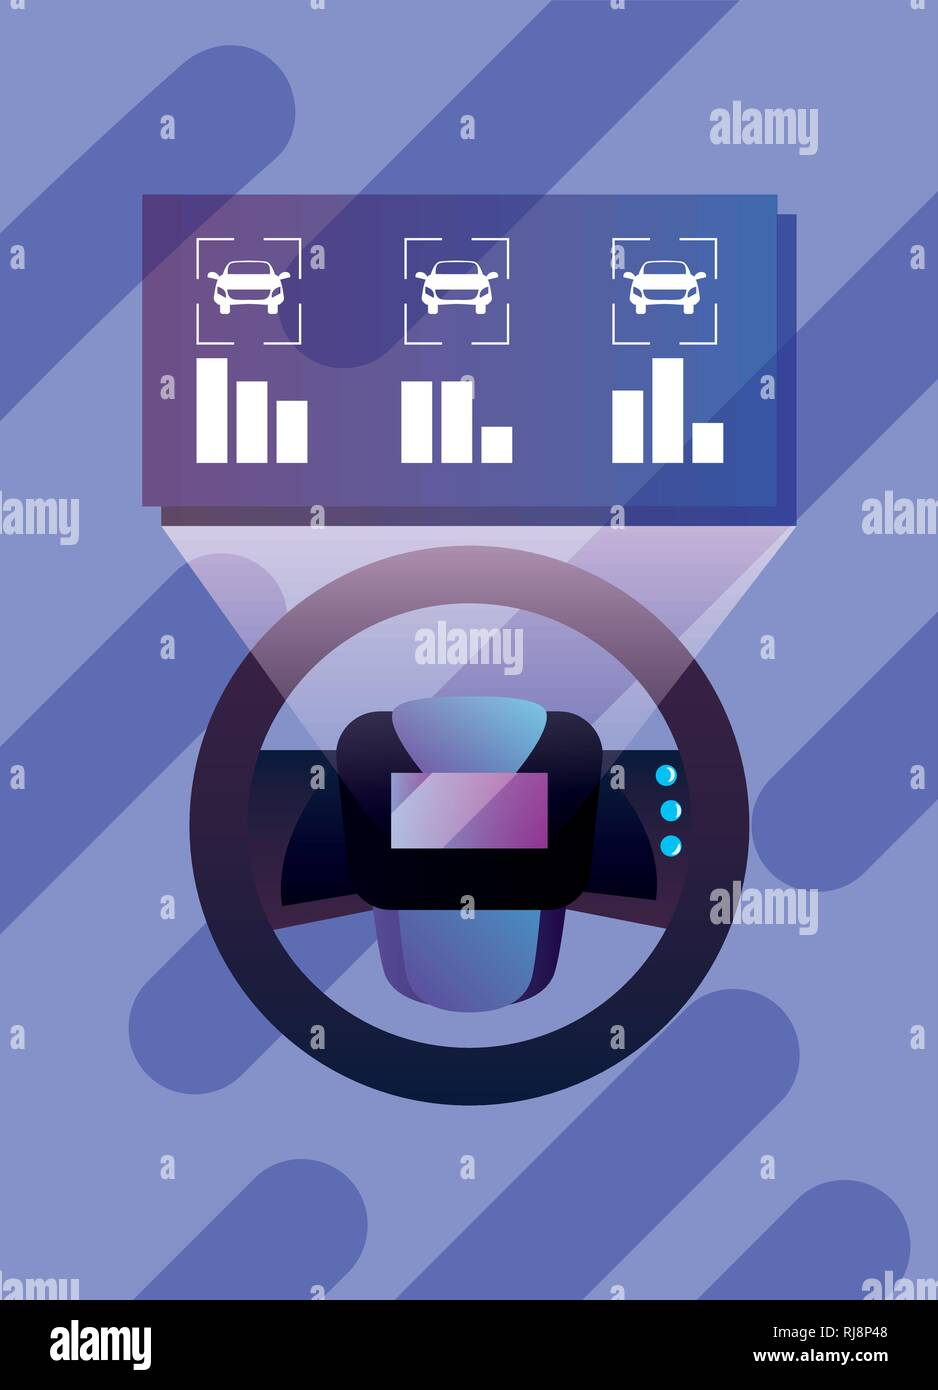 medium resolution of autonomous smart car steering wheel diagram vector illustration